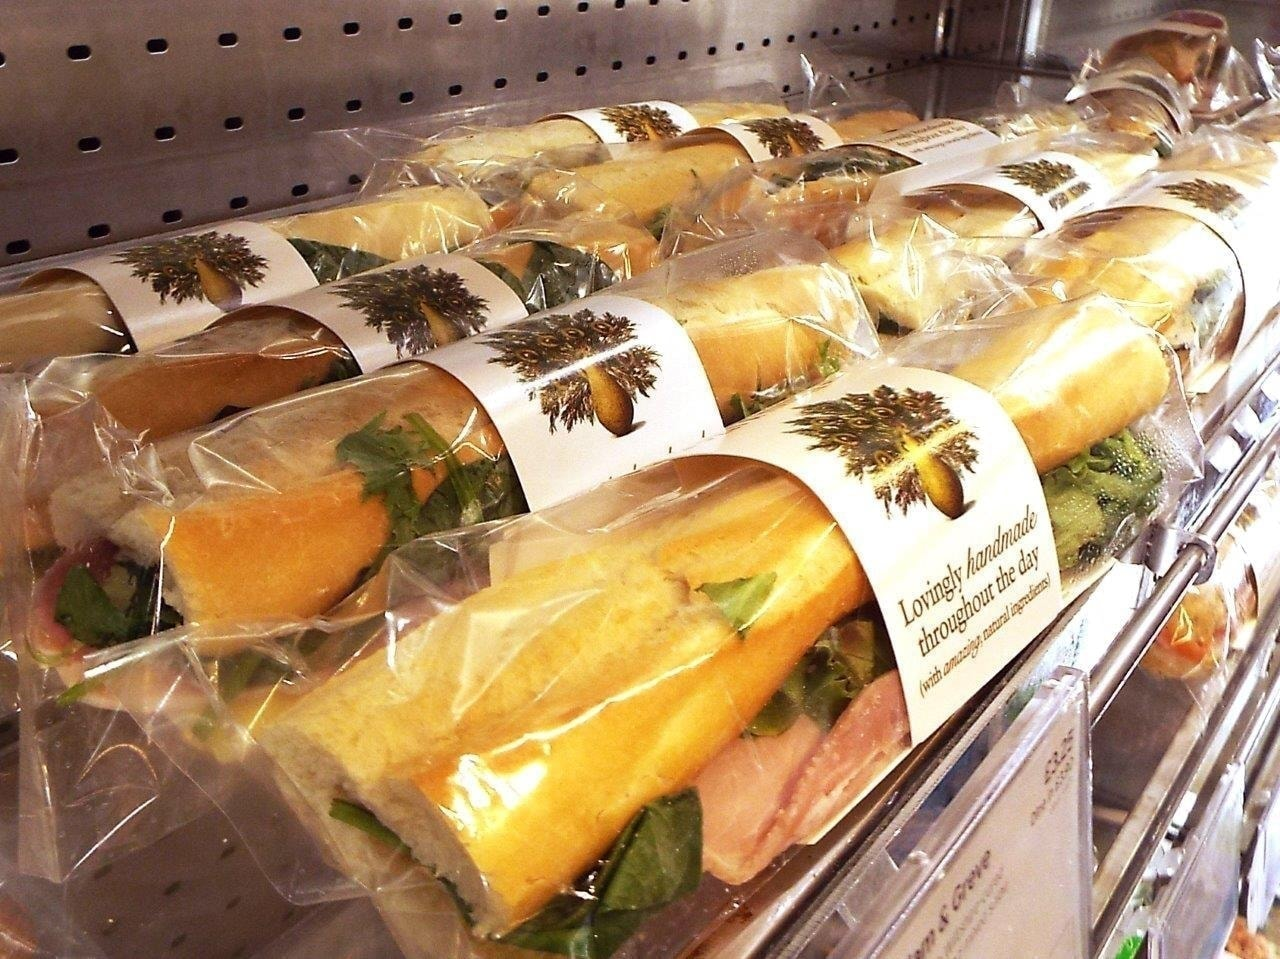 Pret baguette -  Bang bang chicken wrap